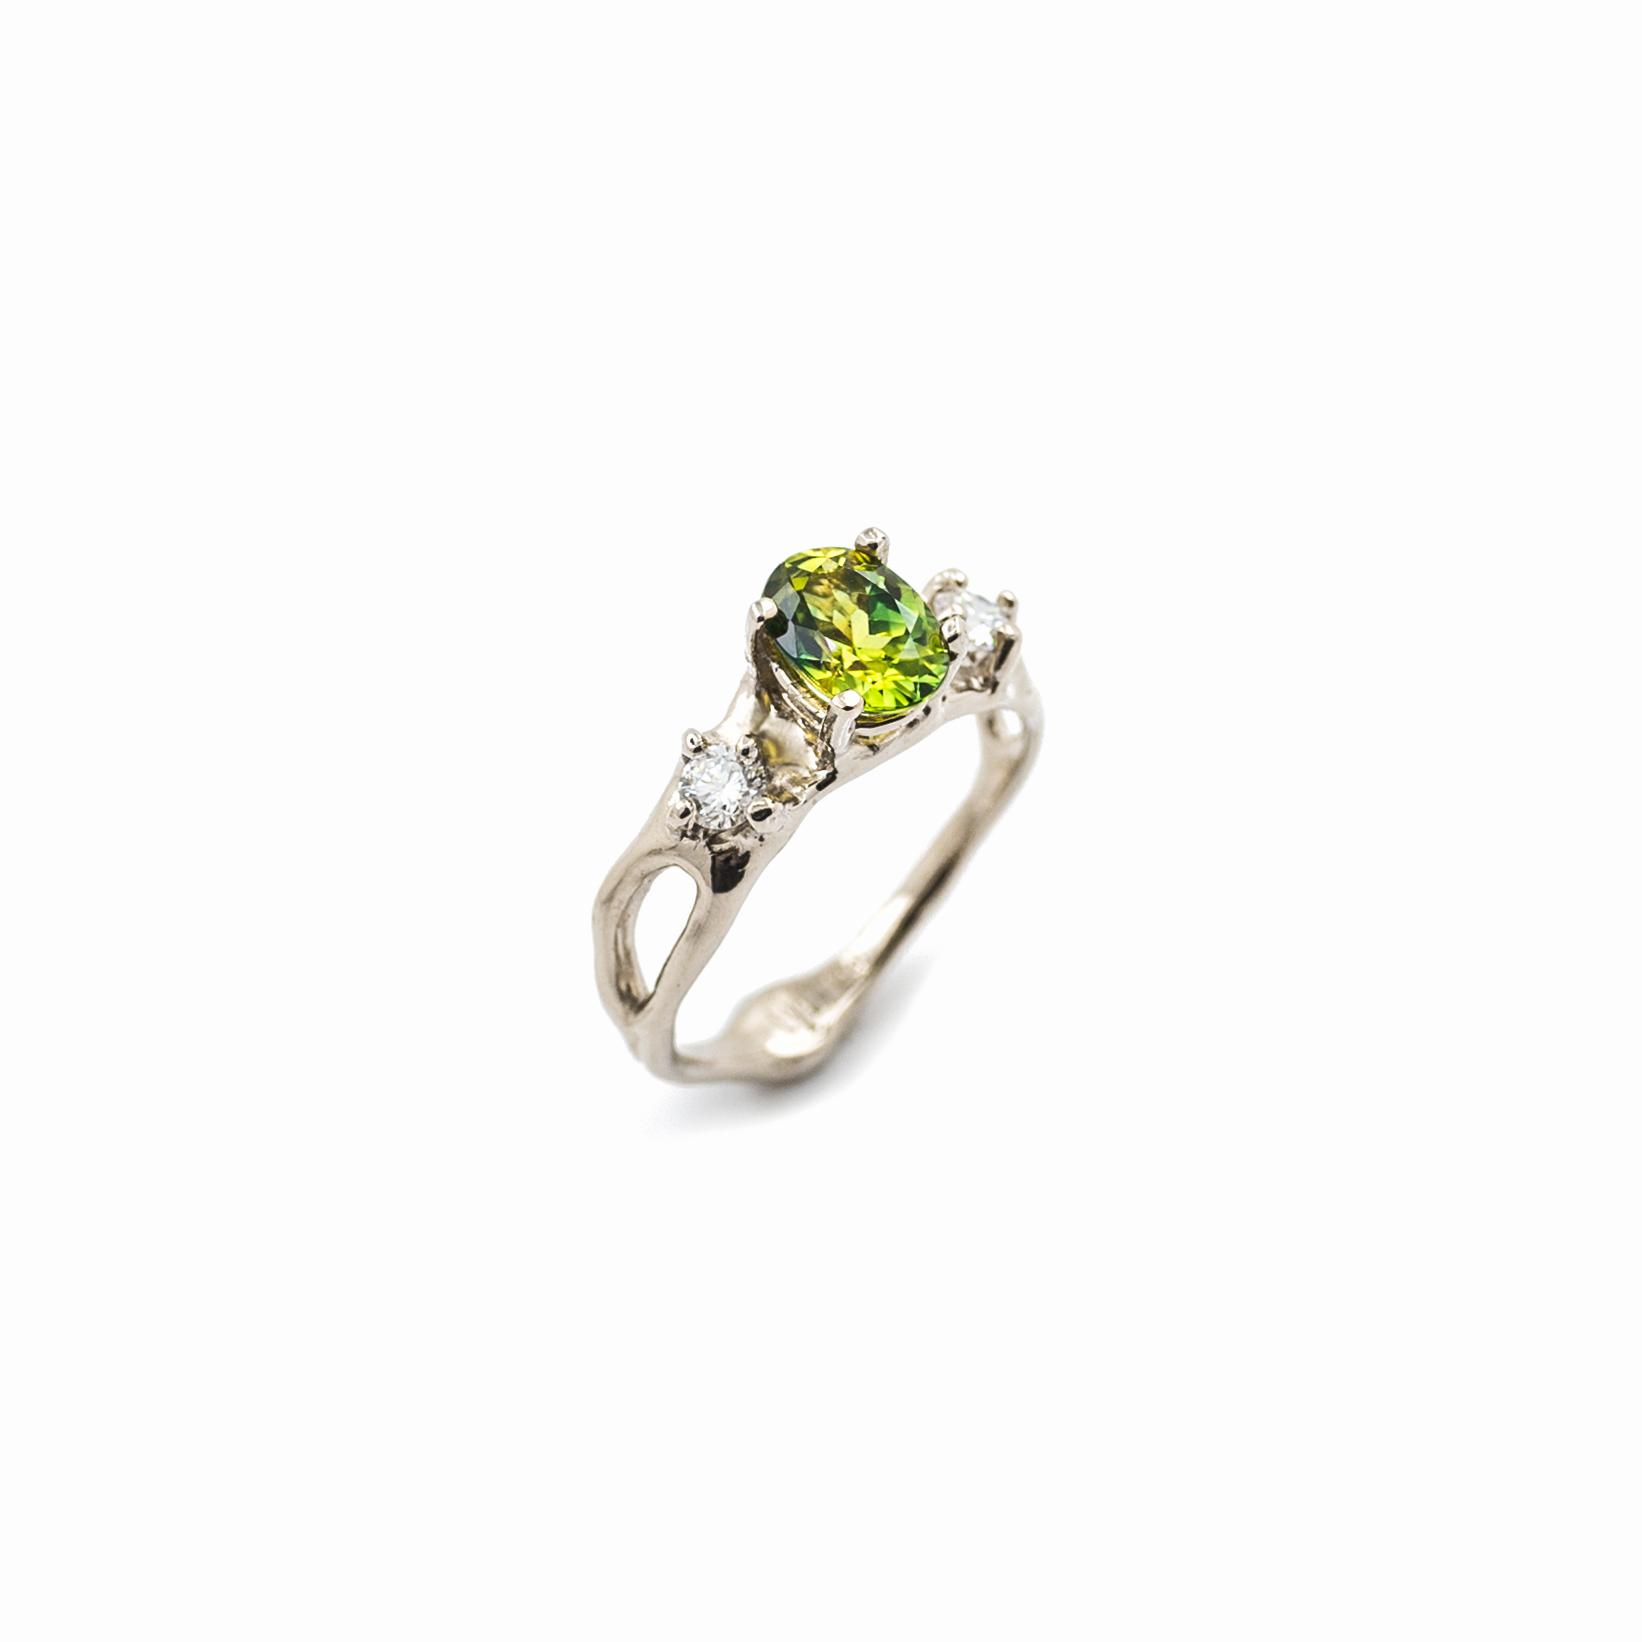 Unfolding Engagement Ring    18ct yellow gold, Australian yellow-green sapphire, white diamonds.